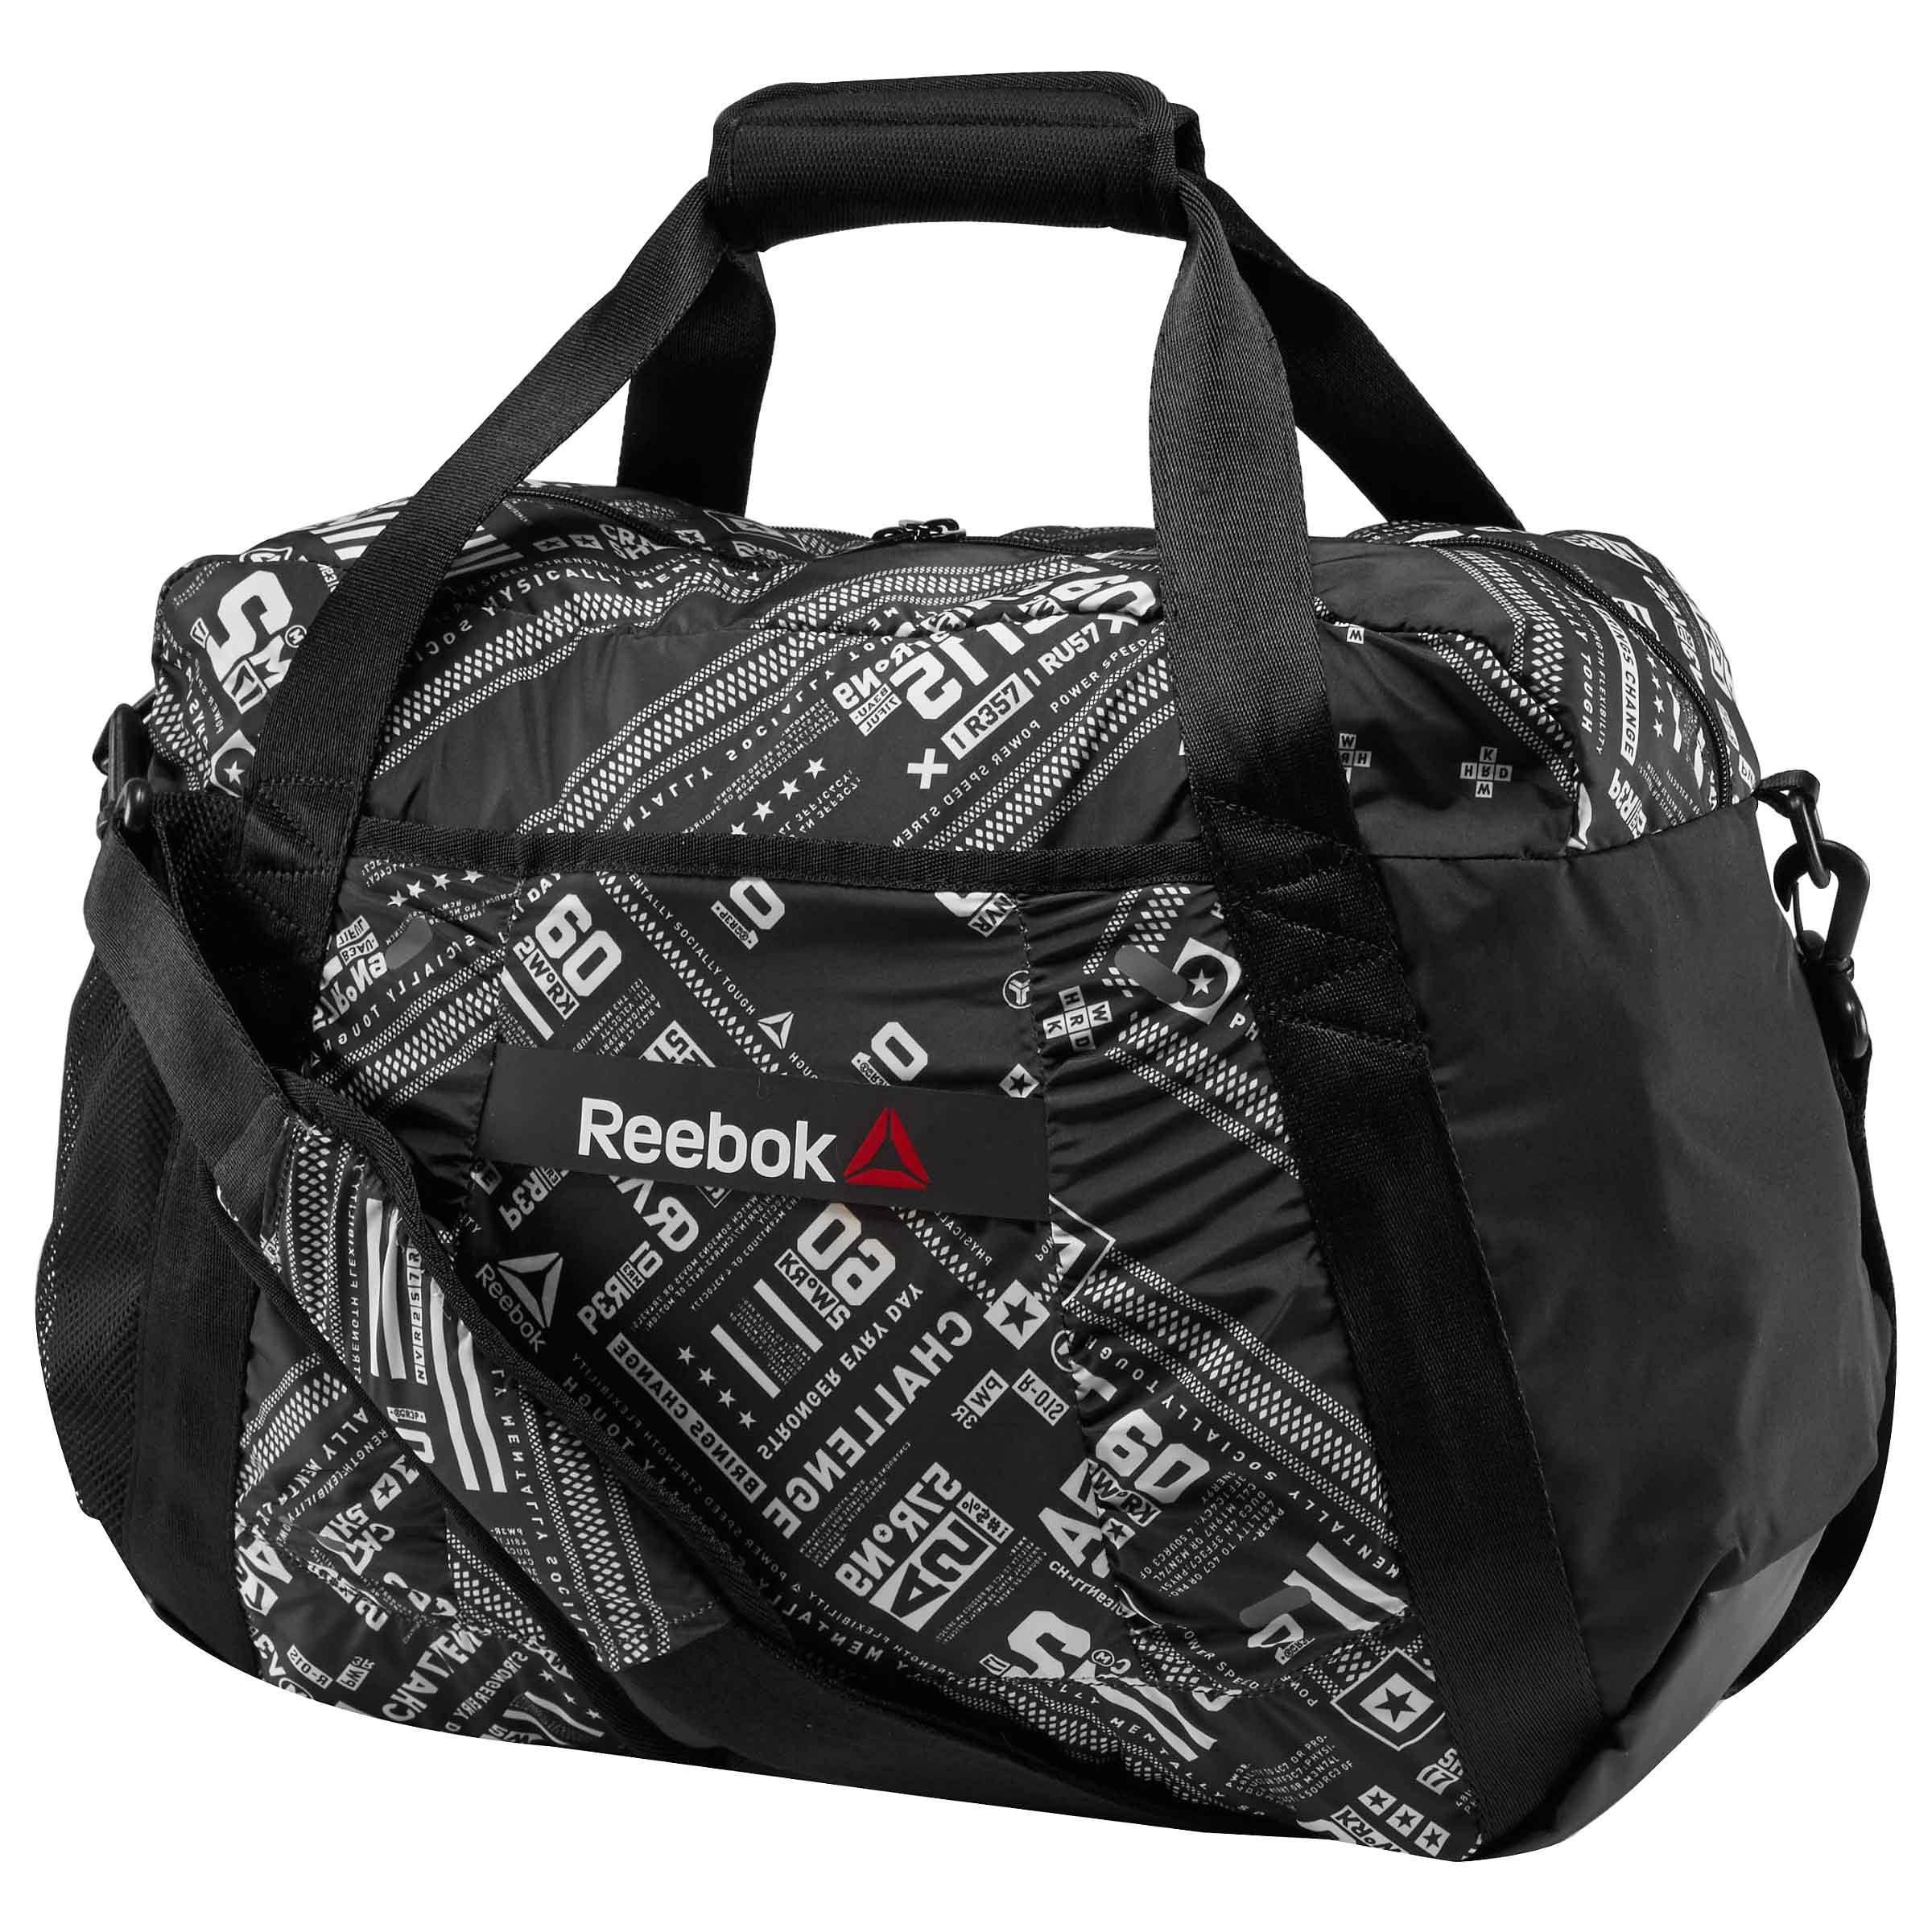 Grip Duffle Bag